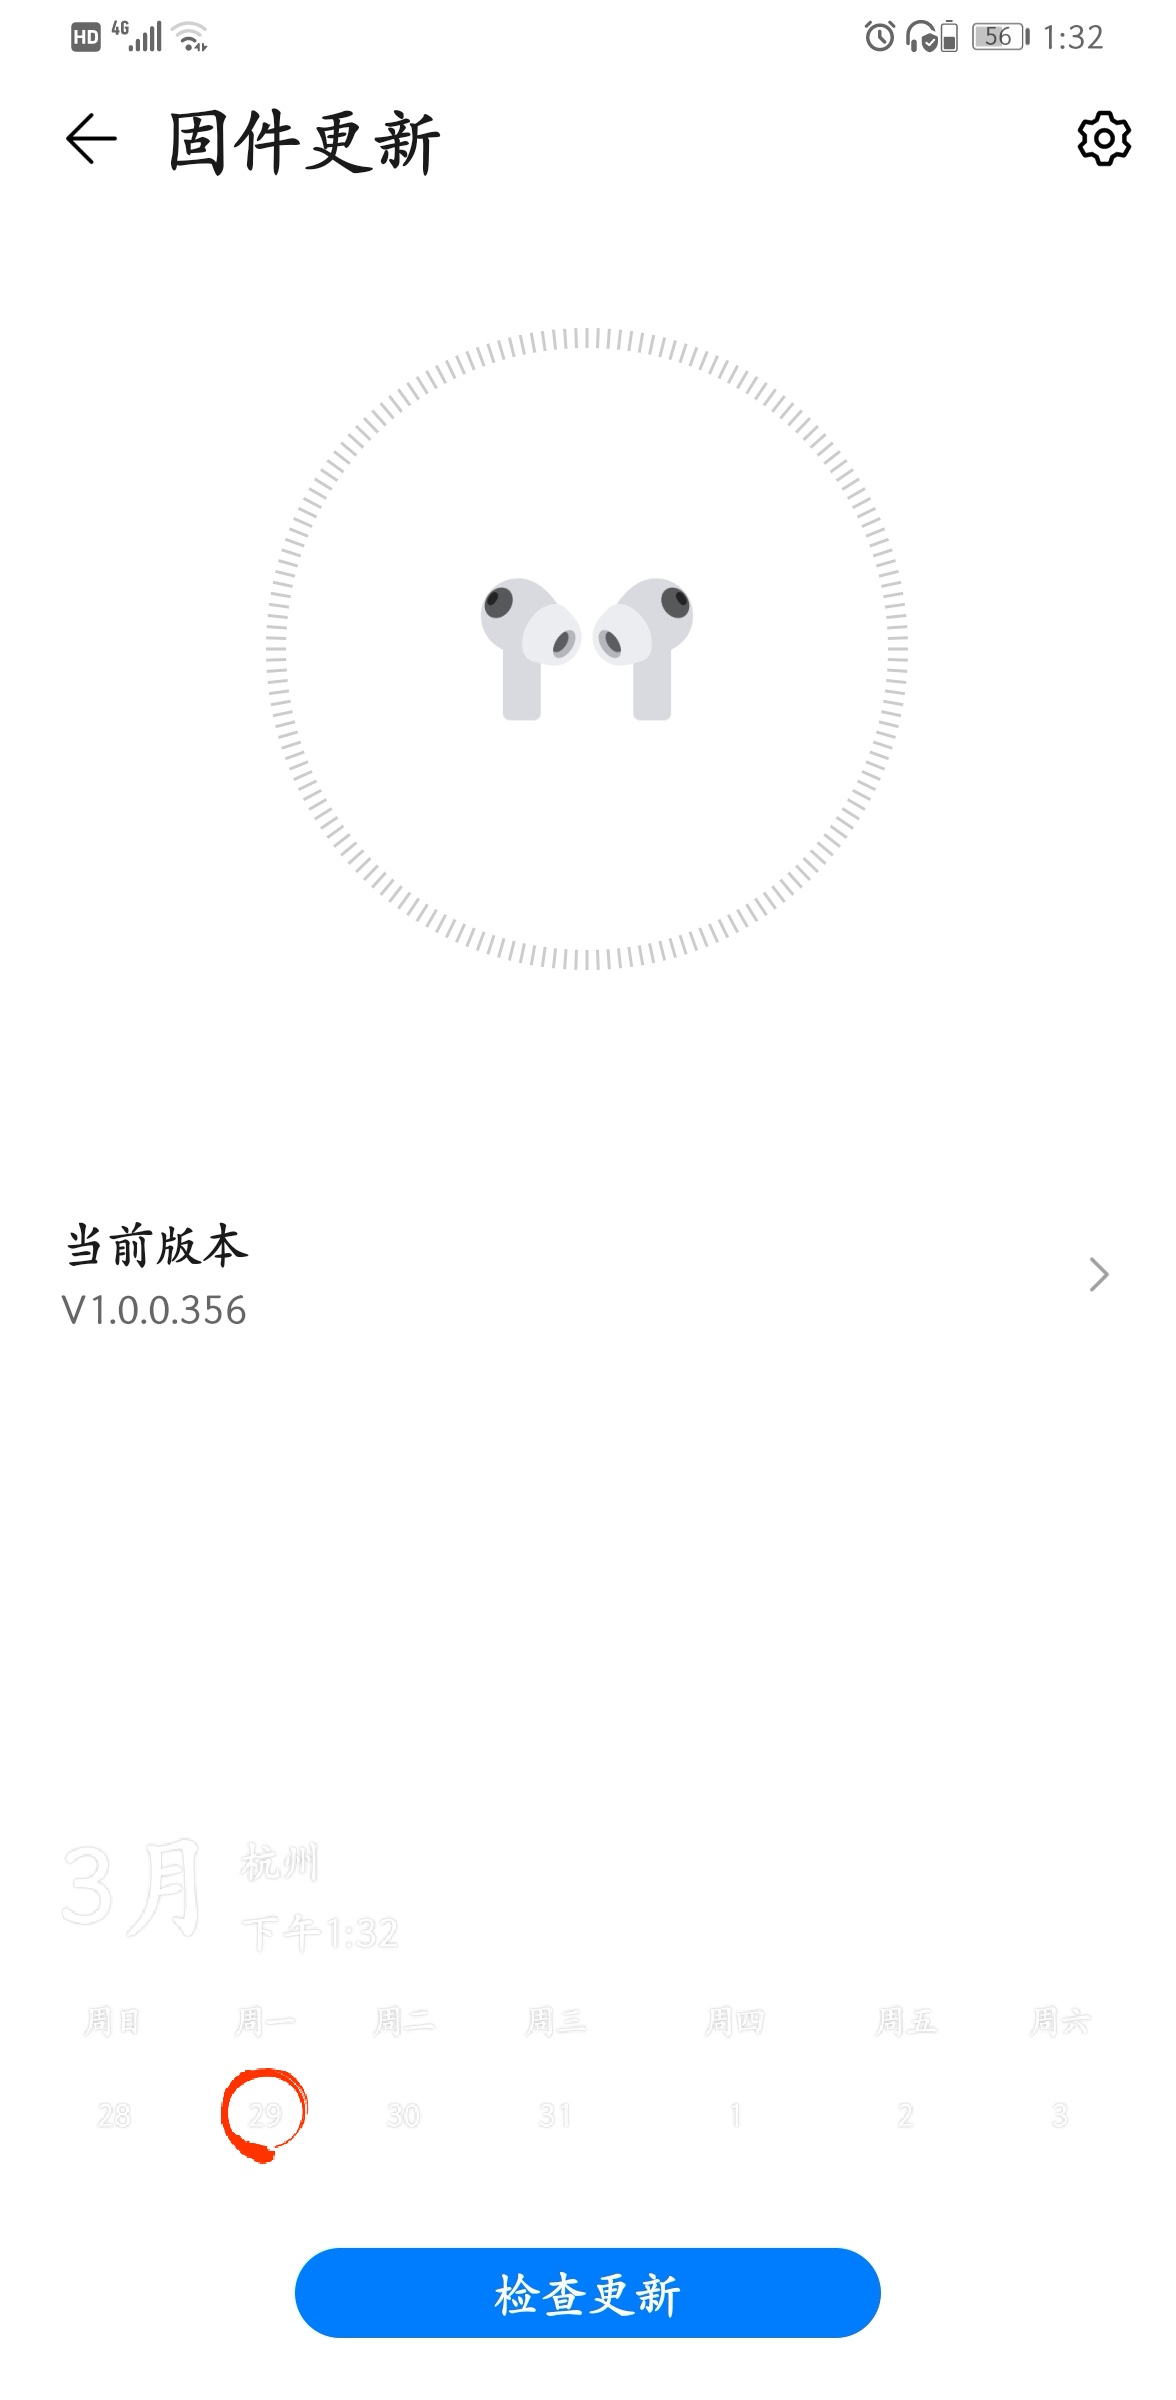 Screenshot_20210329_133252_com.huawei.smarthome_edit_620276216666811.jpg